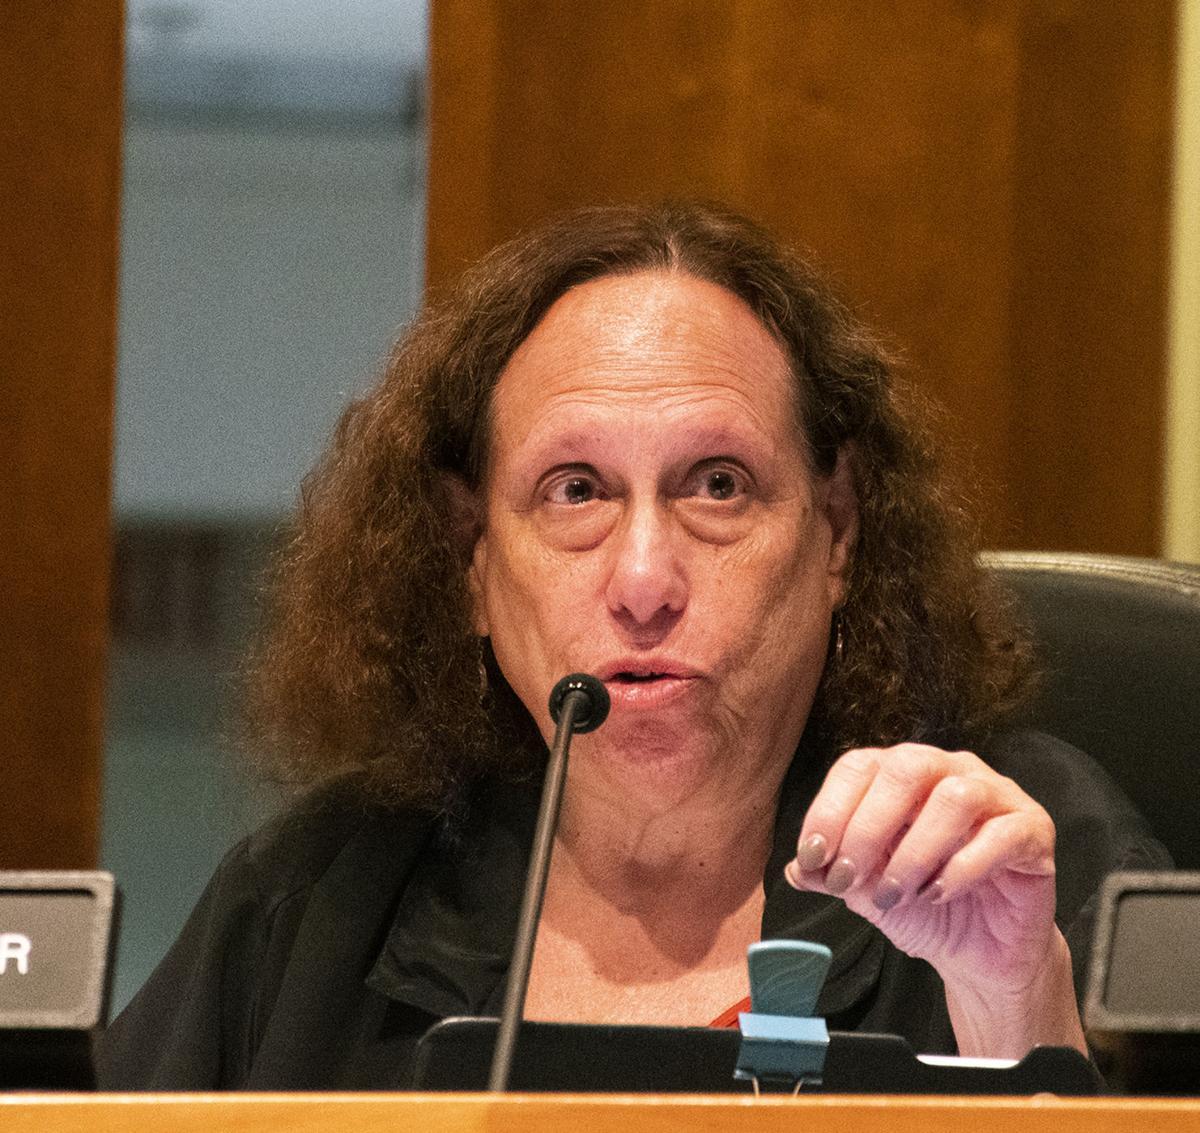 Borough Council Meeting, Theresa Lafer